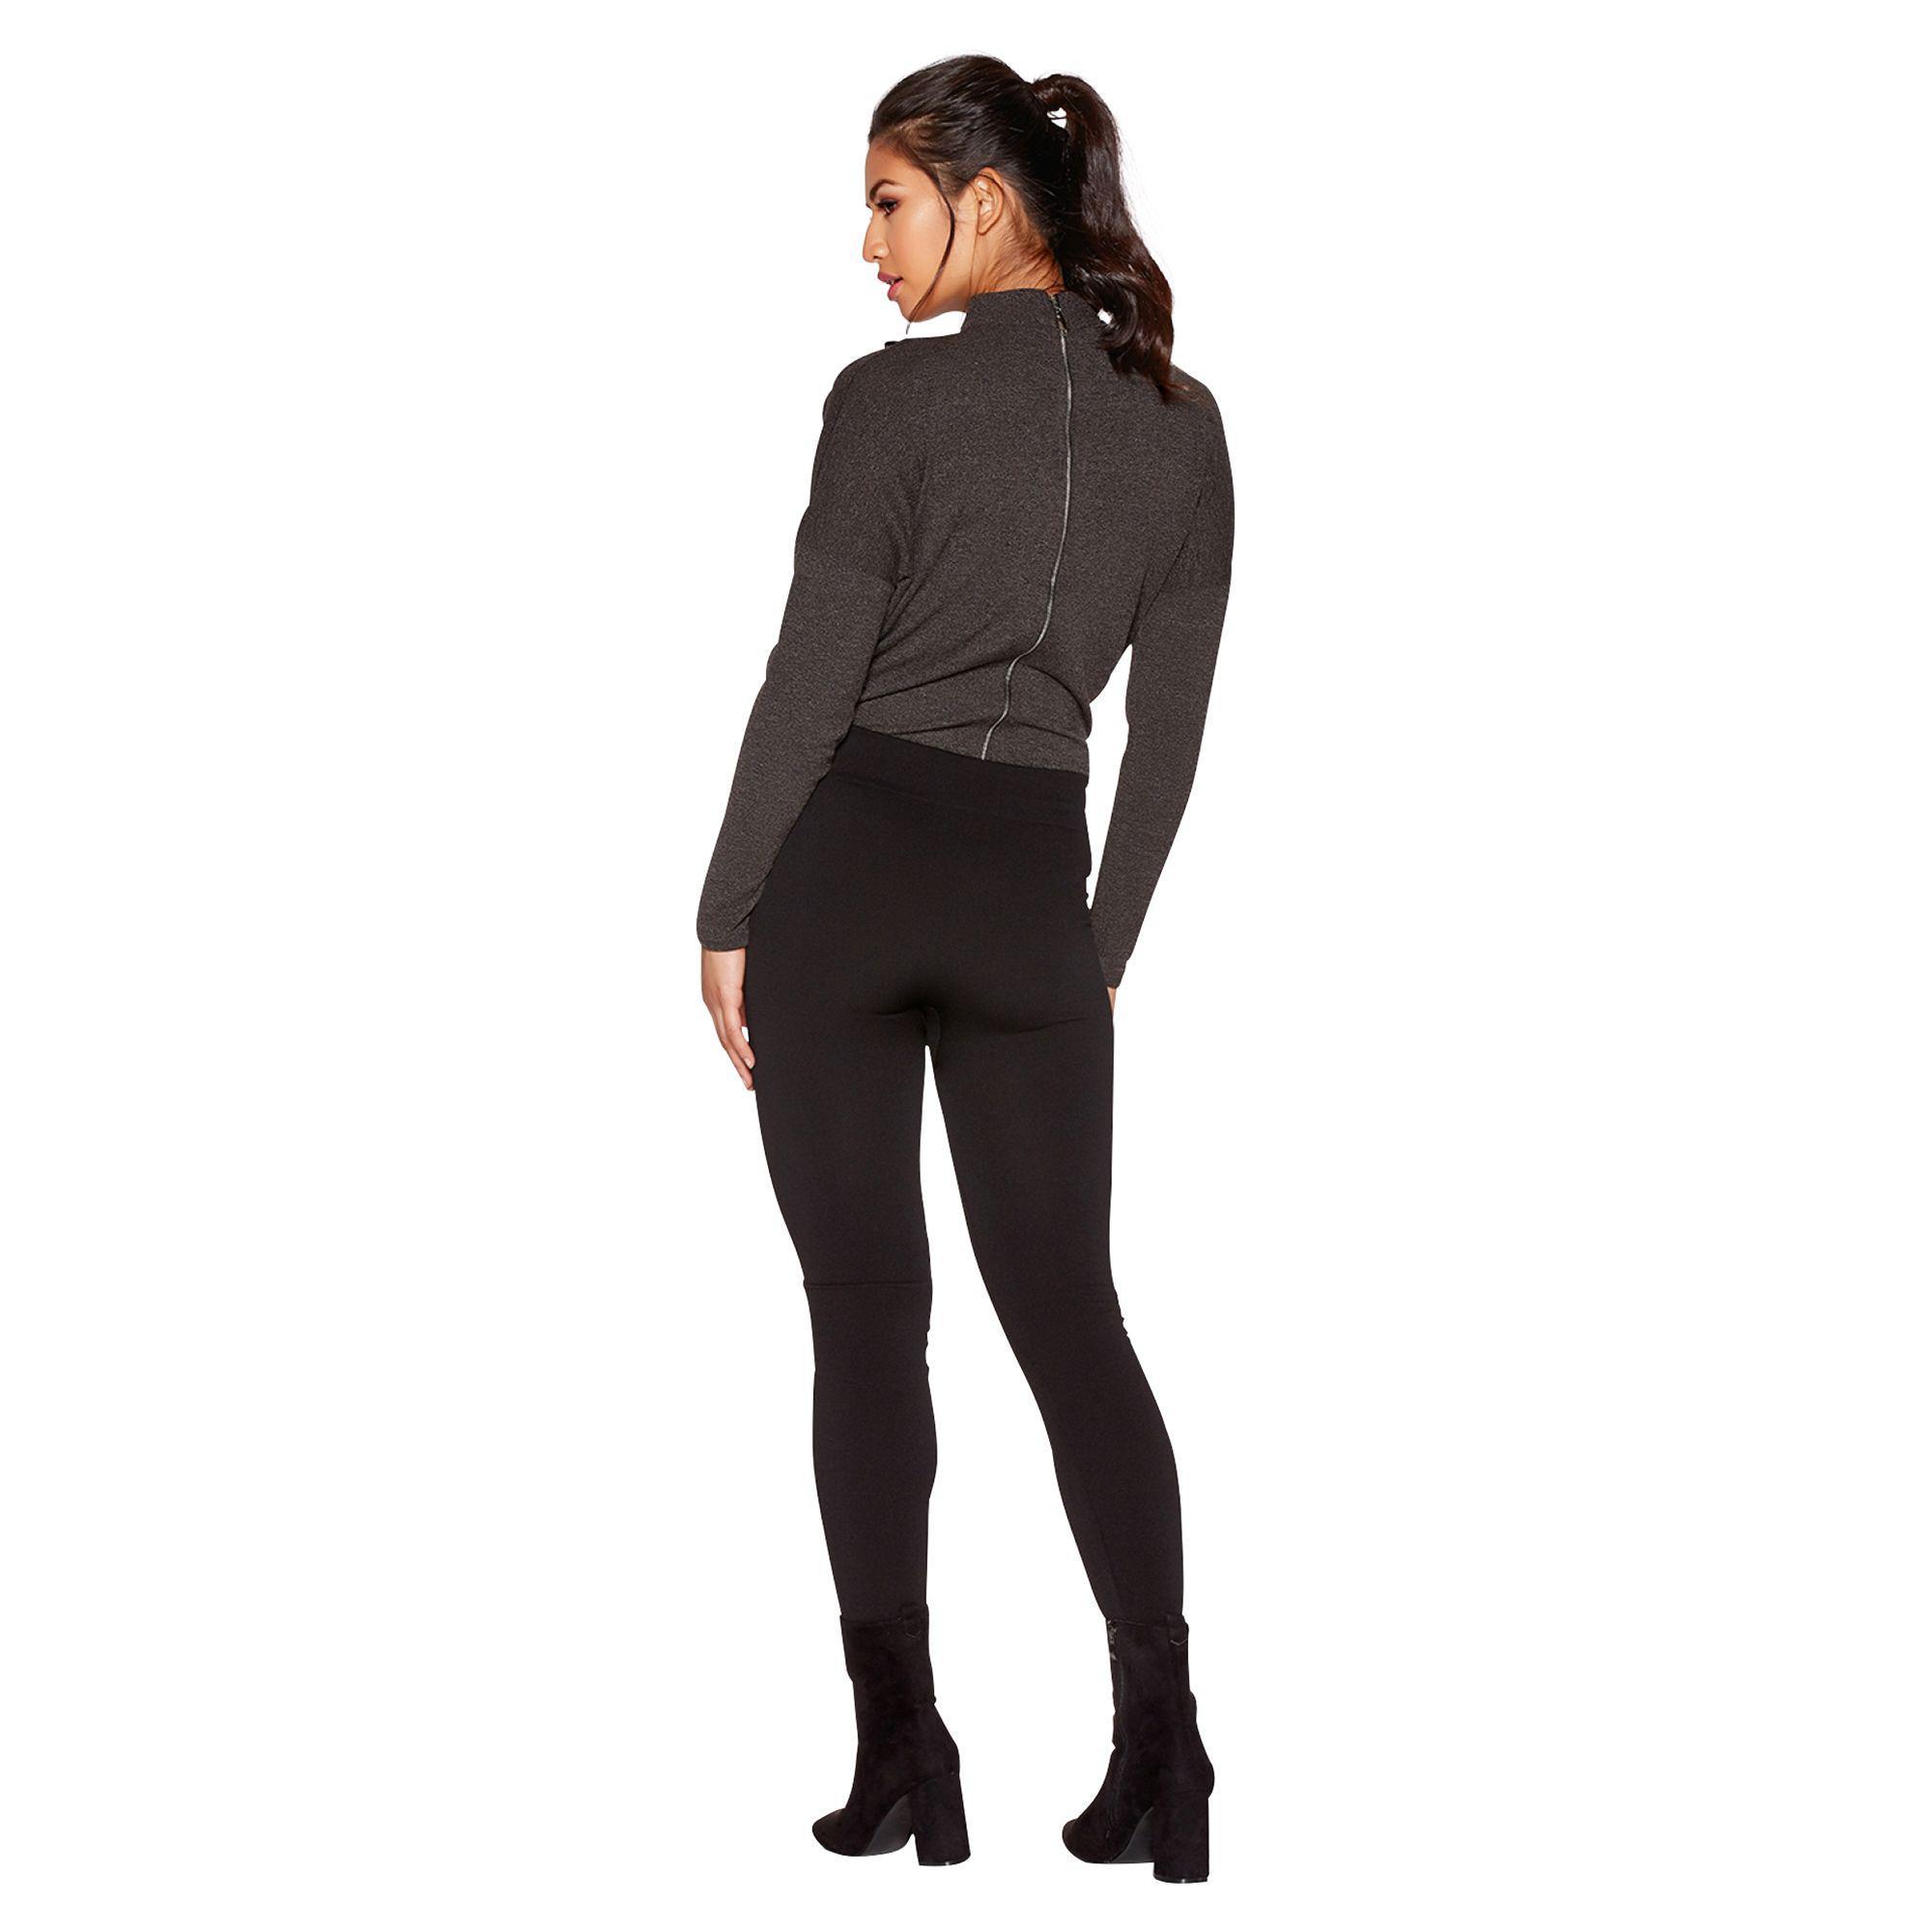 2ac9e8bc7287d7 Quiz - Black Fleece Lined Zip Detail Leggings - Lyst. View fullscreen